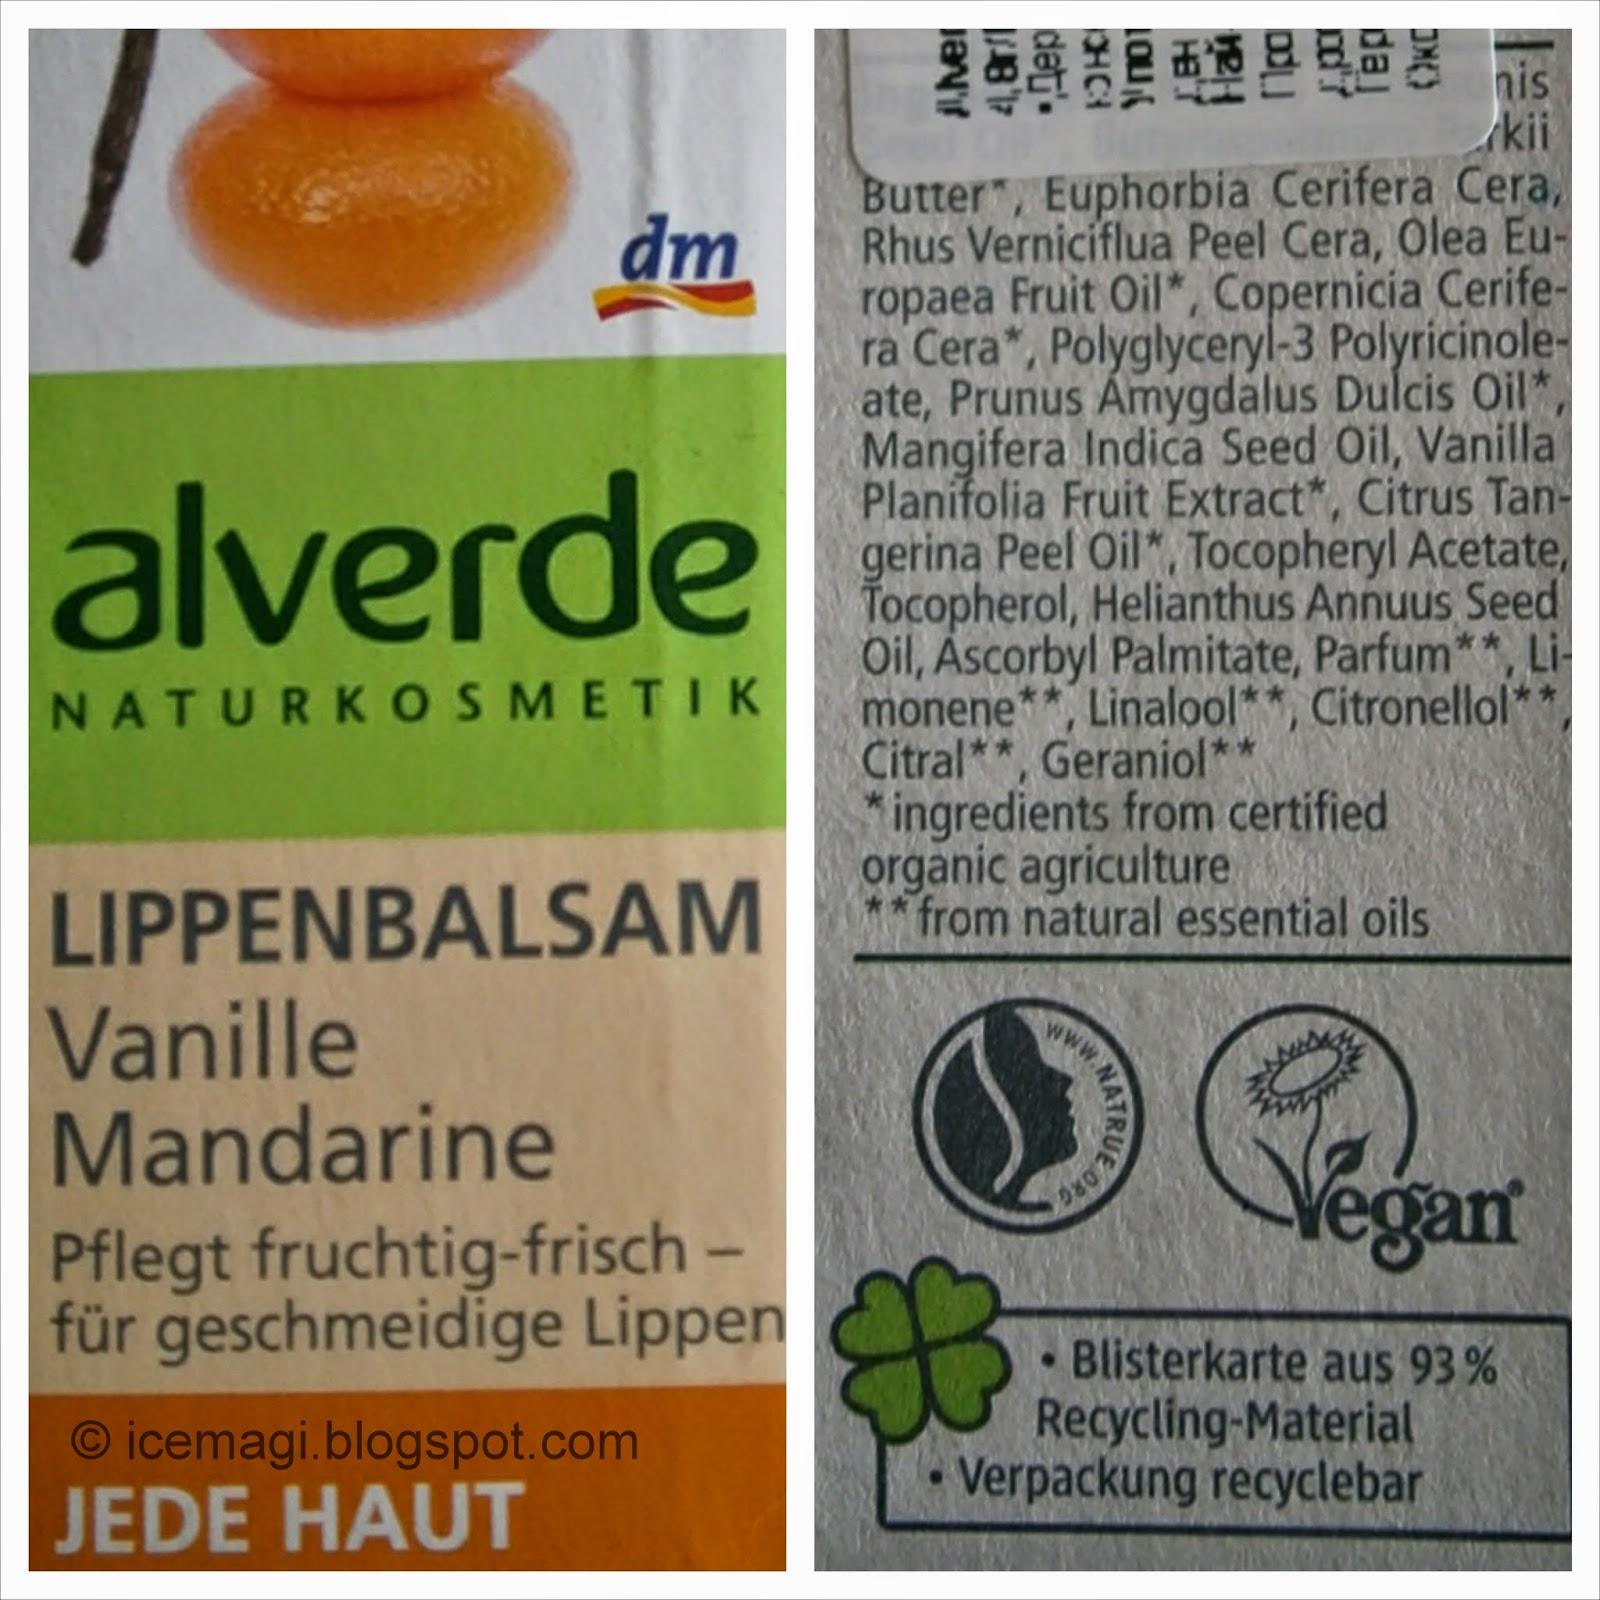 Alverde Vanillа Mandarin Lip balm